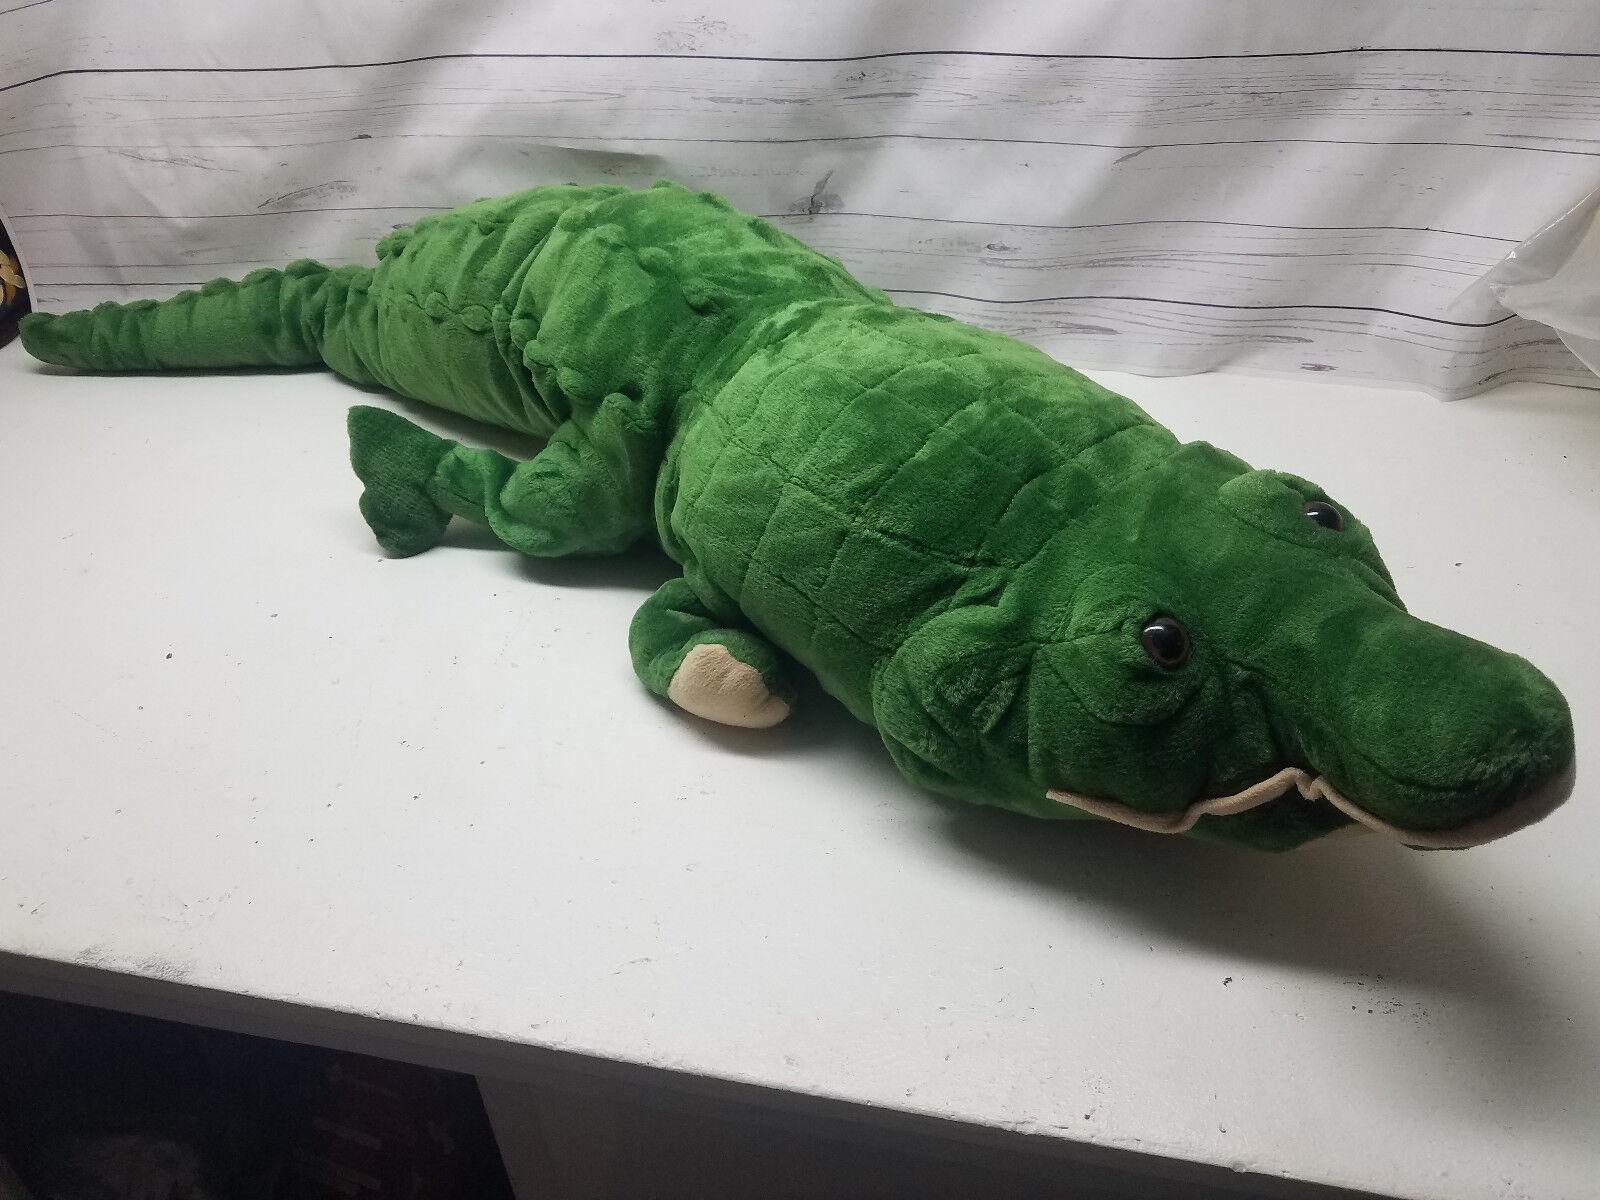 Goffa Alligator Crocodile Reptile Plush Large Lifelike 52  Stuffed Animal Toy